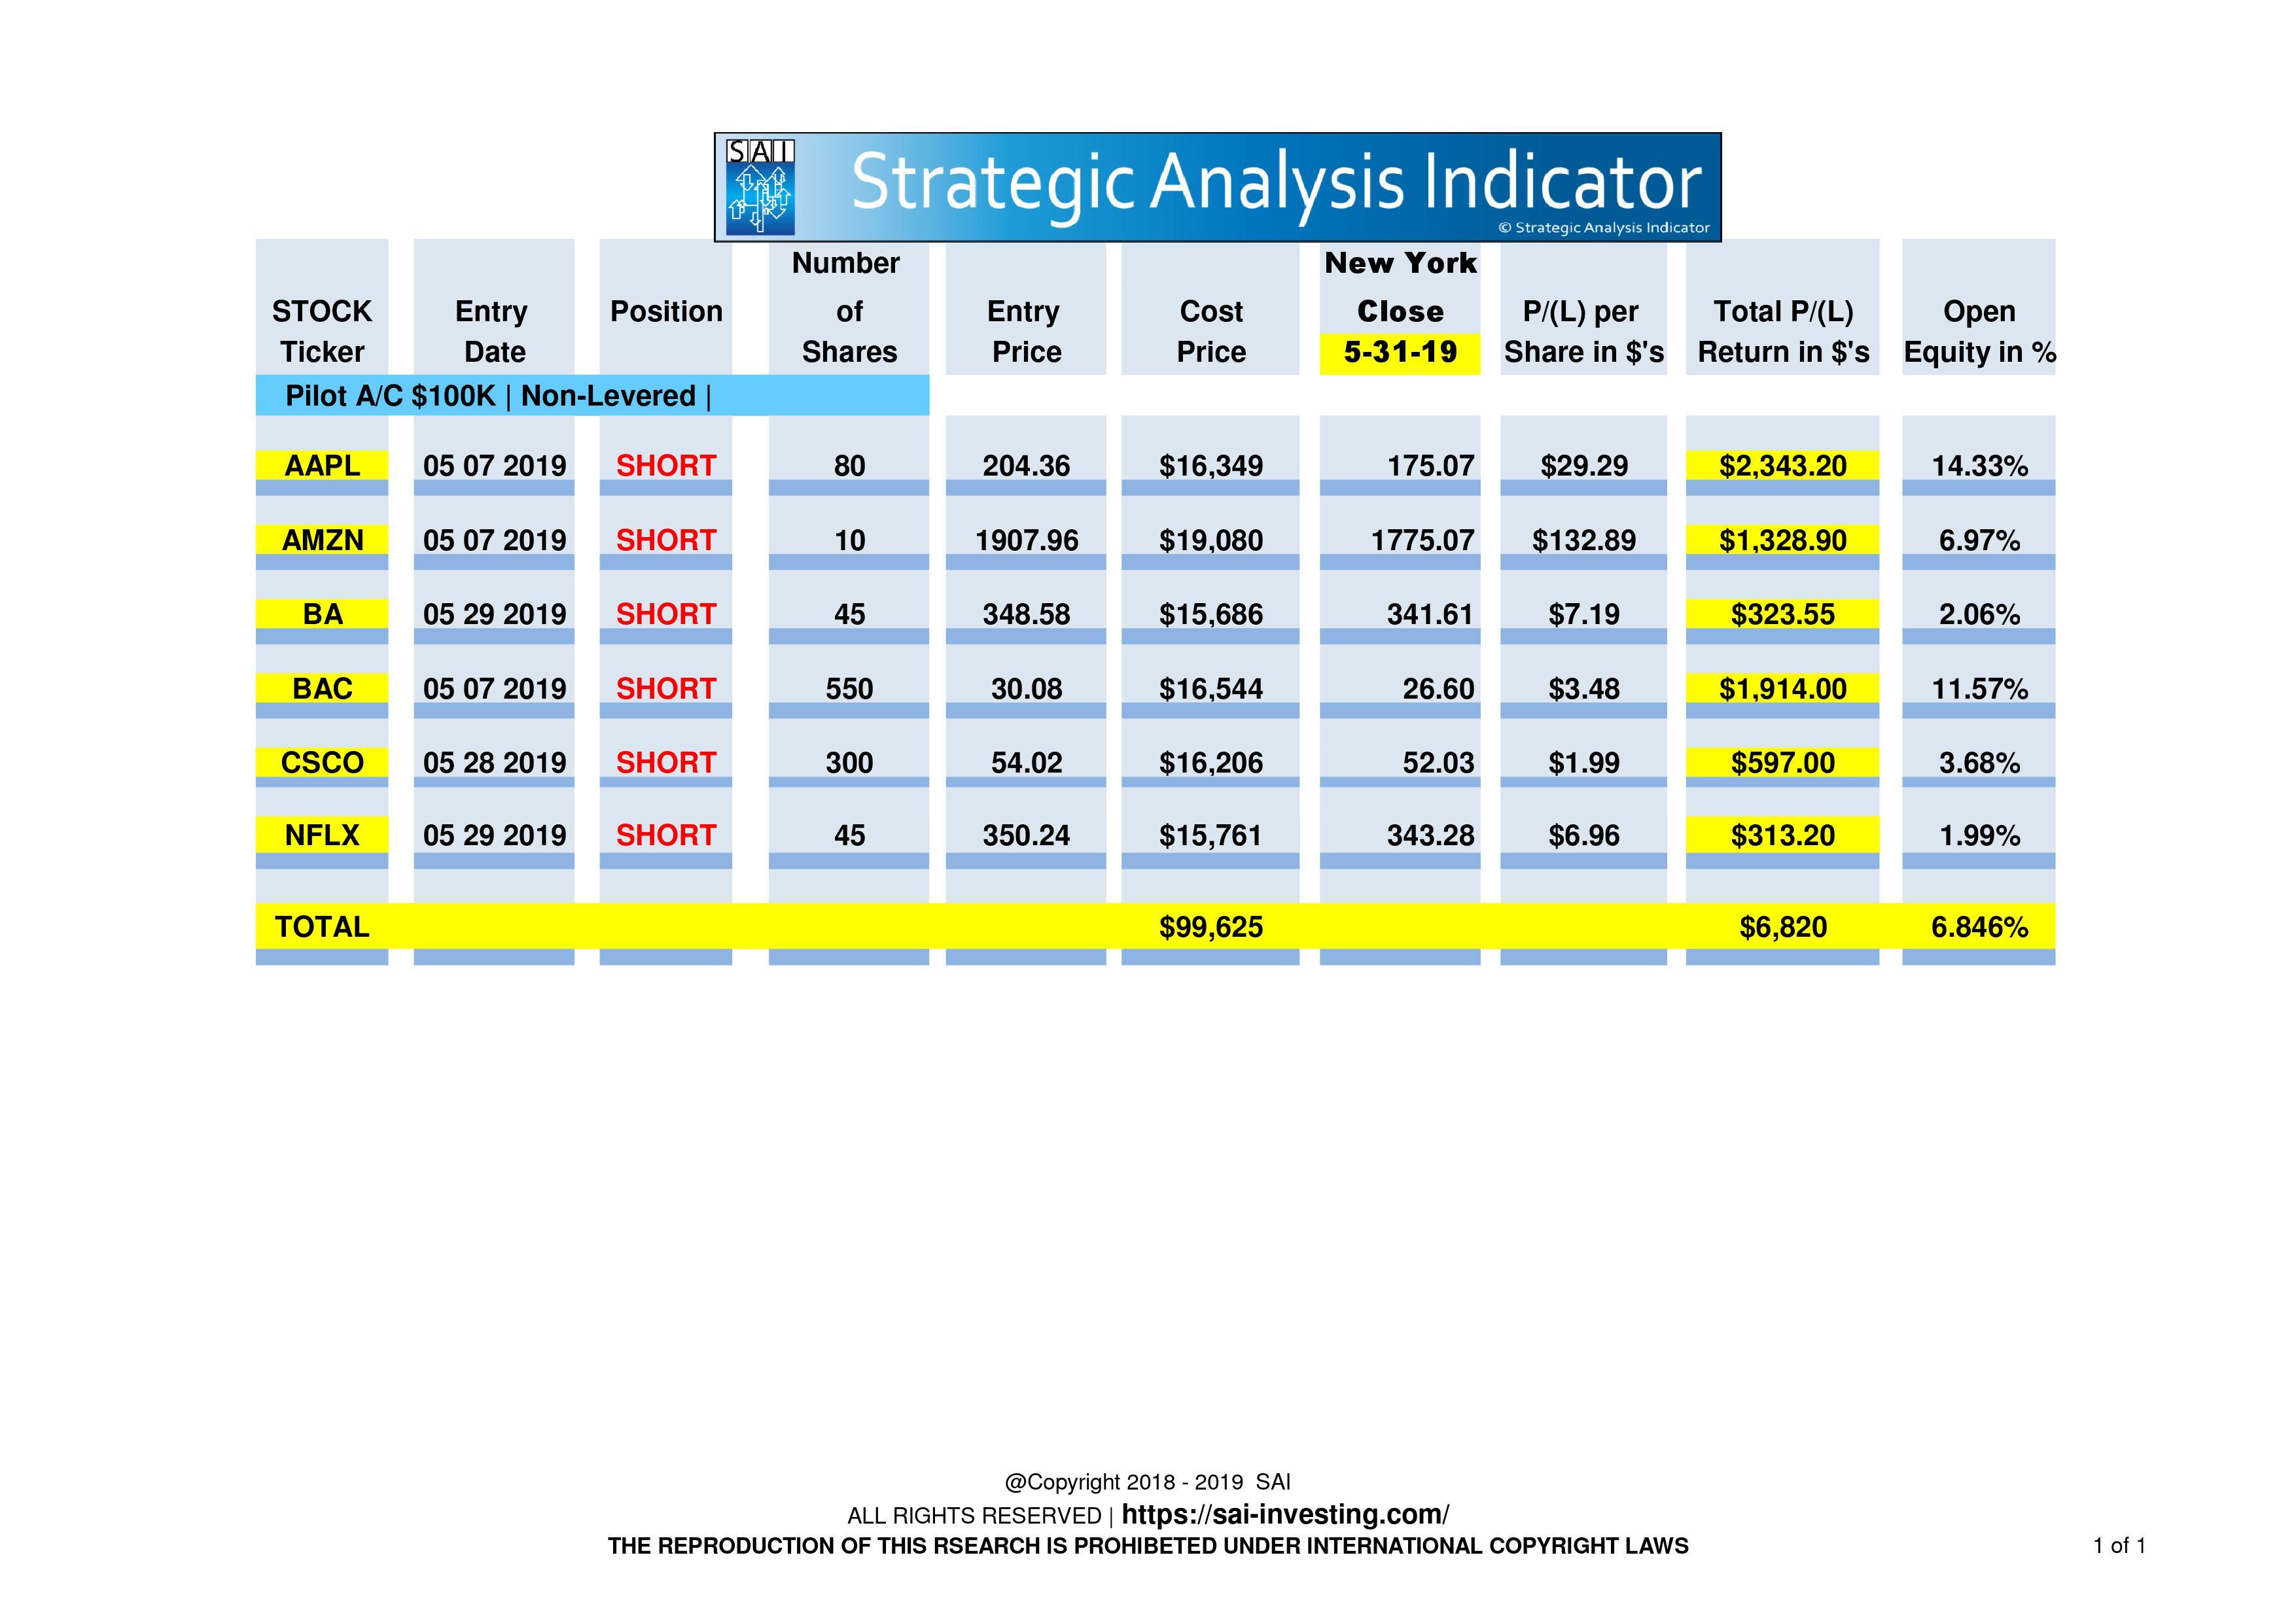 Pilot Stock Portfolio sample for May 31st 2019